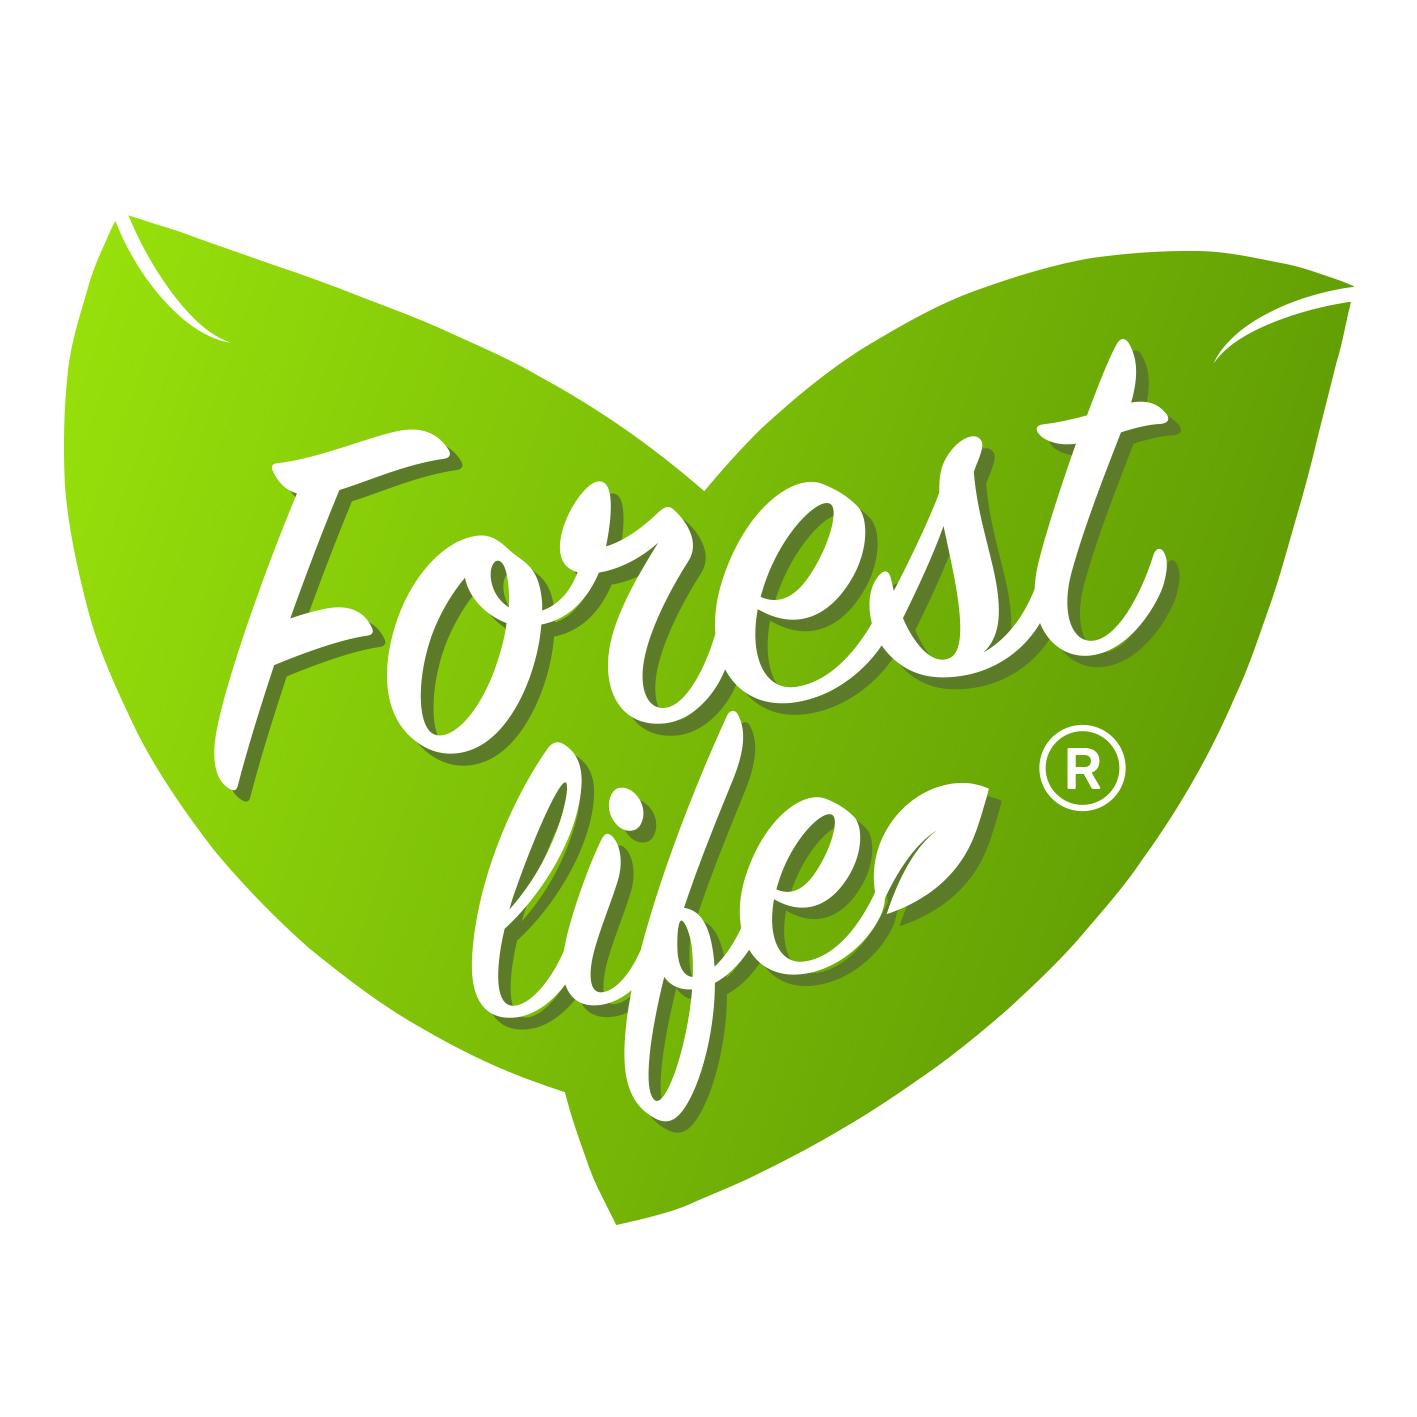 LOGO_FORESTLIFE02C.jpg